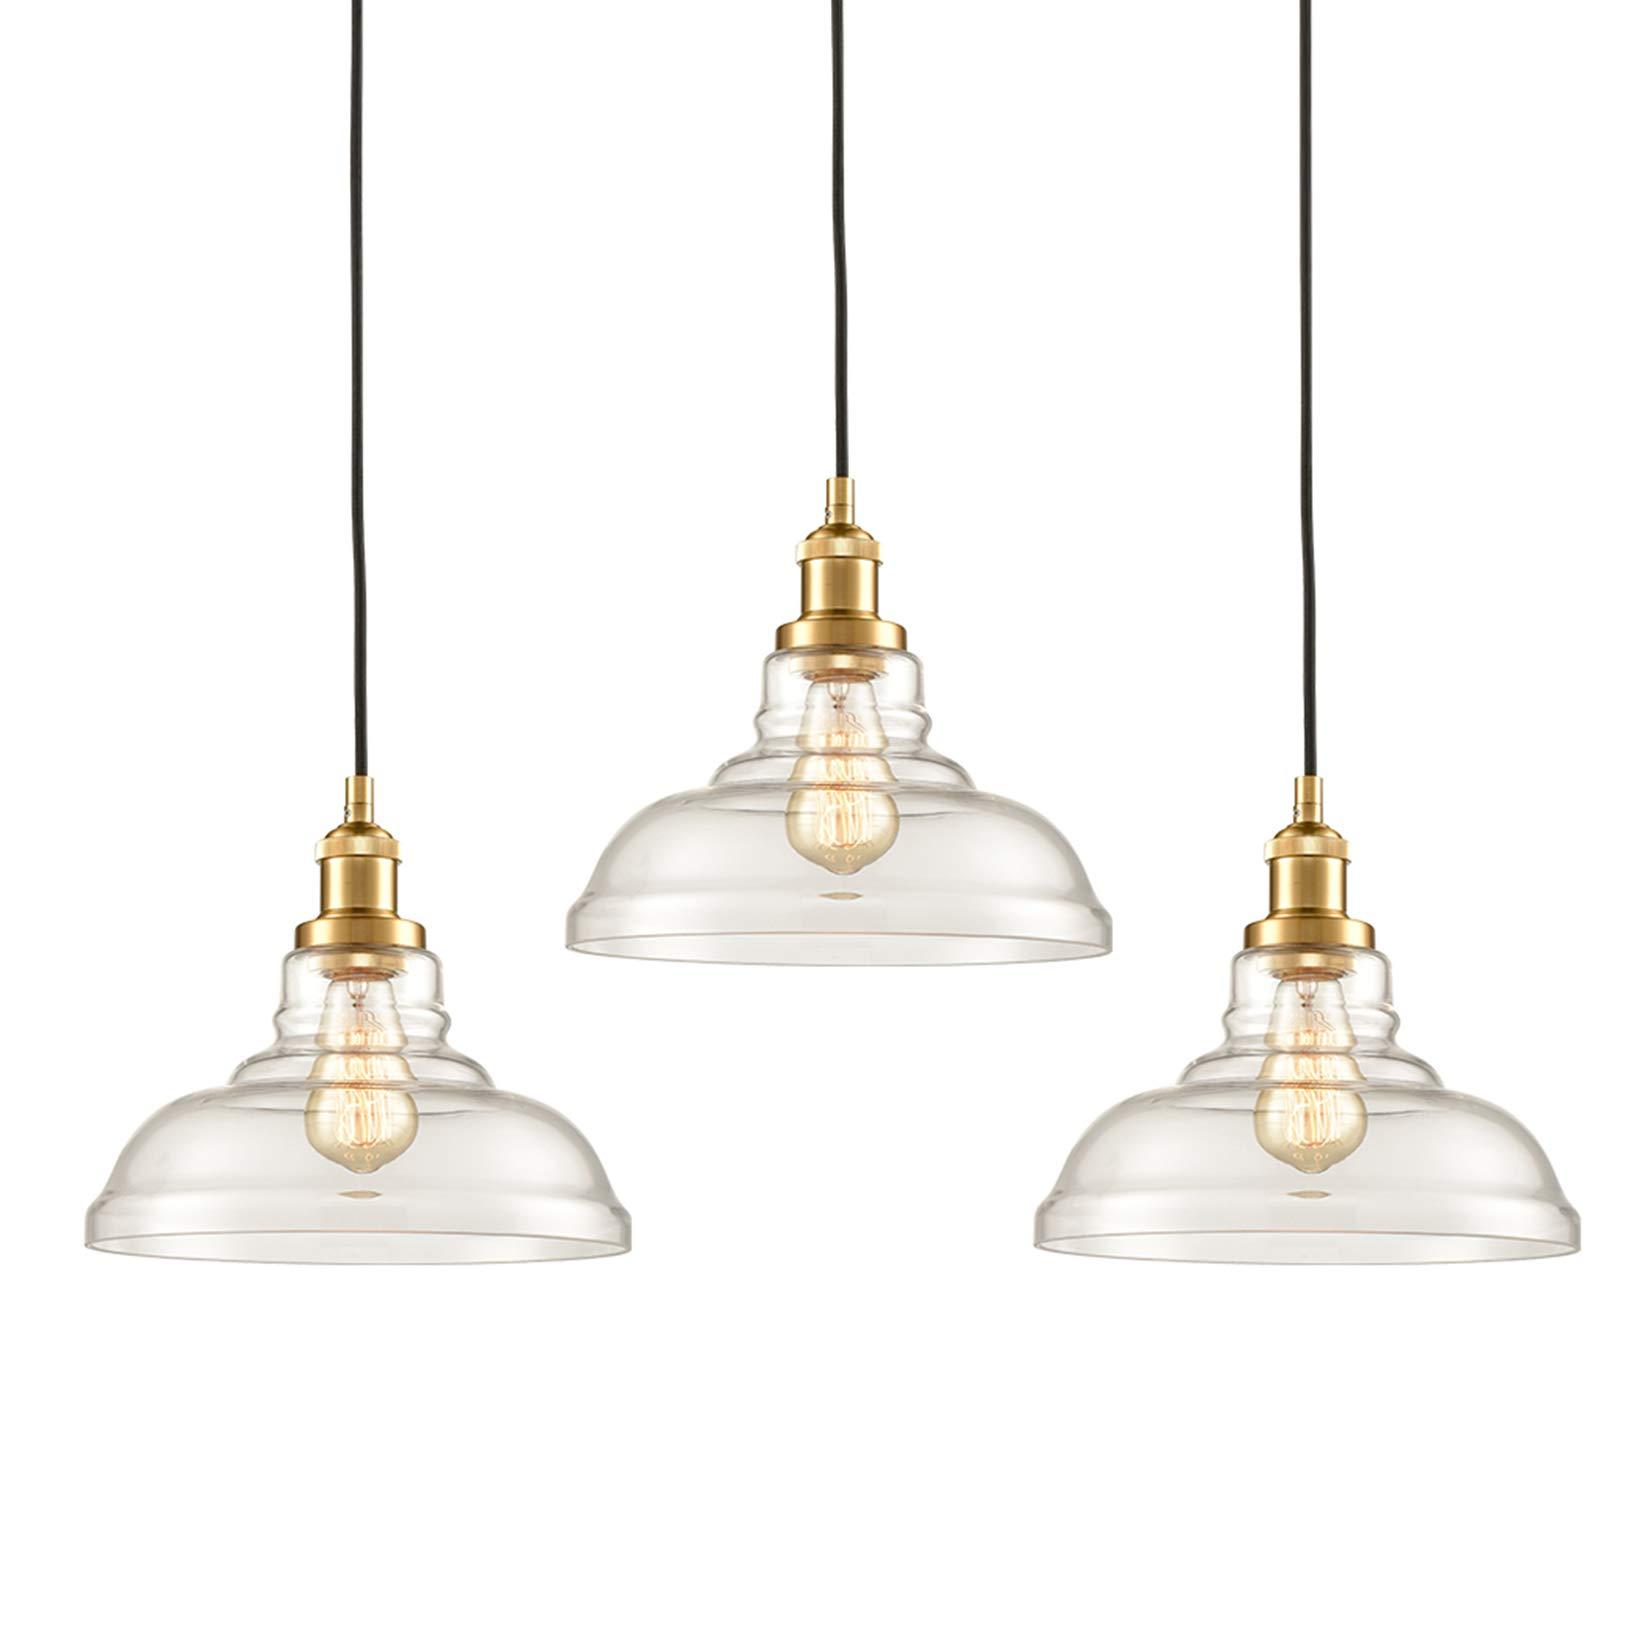 CLAXY Industrial Brass Pendant Lighting Glass Kitchen Island Hanging Lights-3 Pack